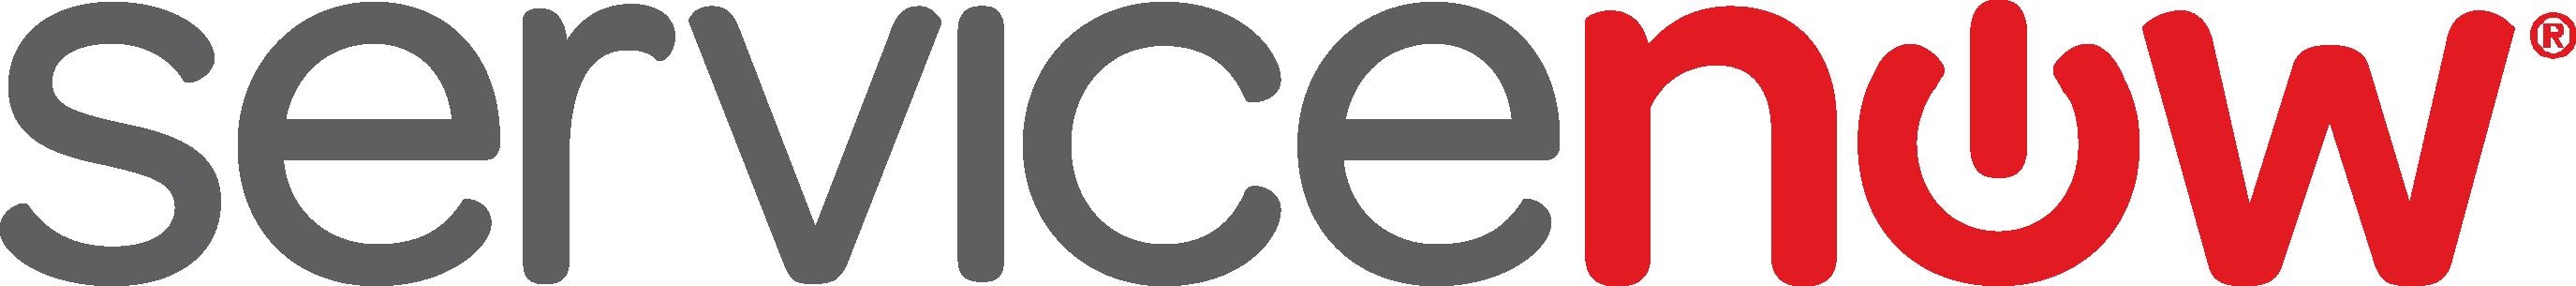 Servicenow Logo Pdf Technology And Company Logos